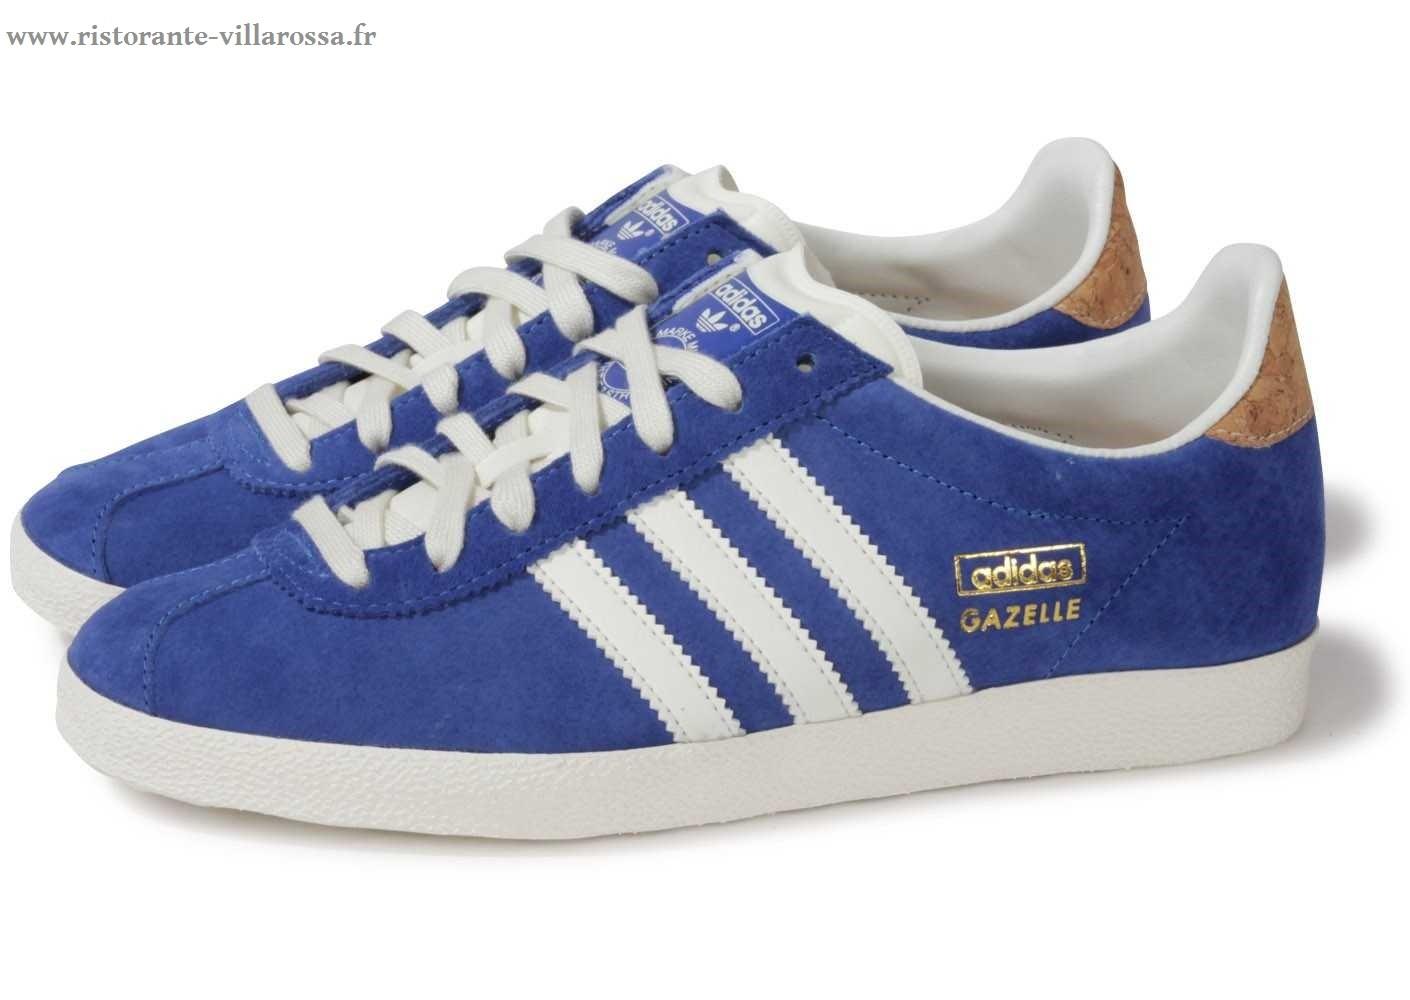 chaussure adidas femme bleue gazelle